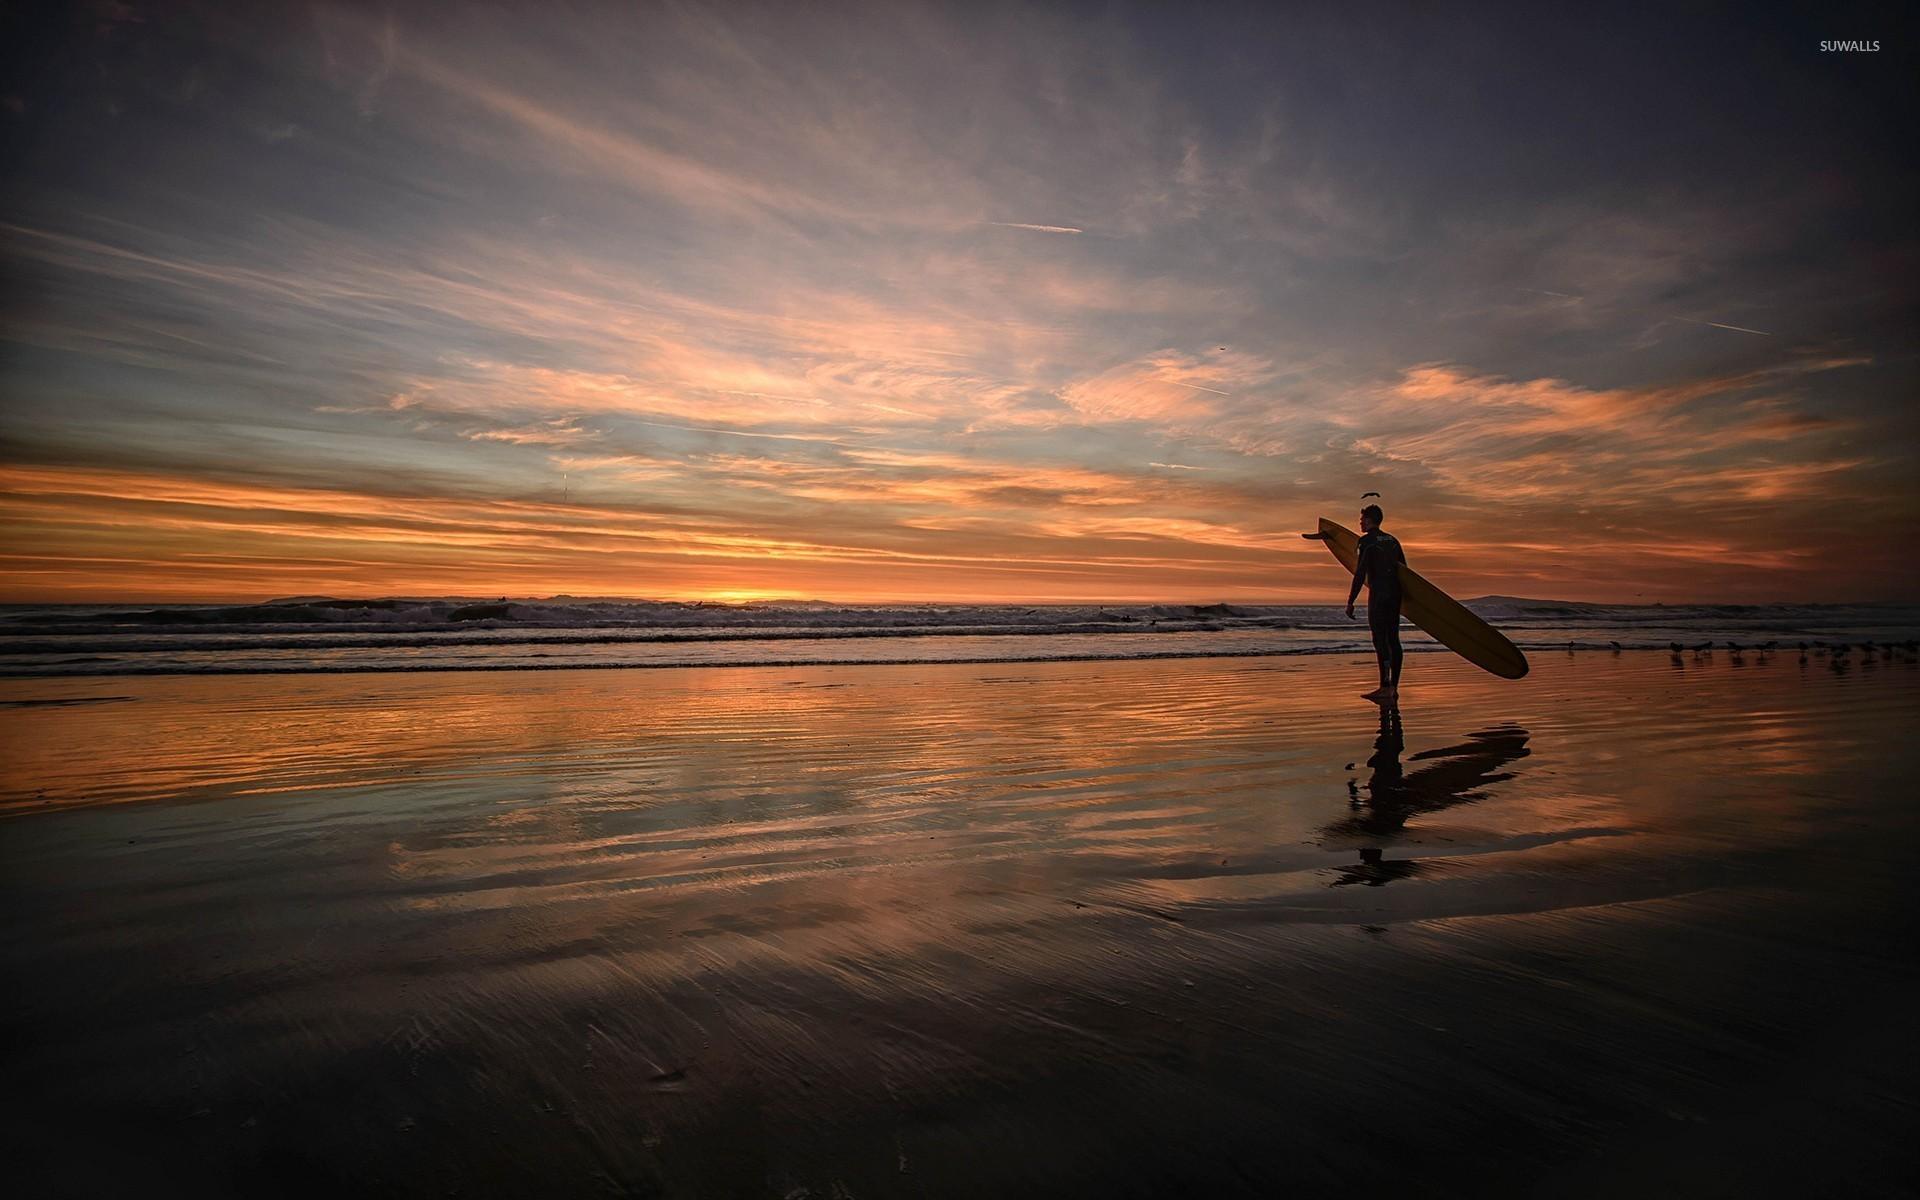 surfer sunset wallpaper wwwimgkidcom the image kid